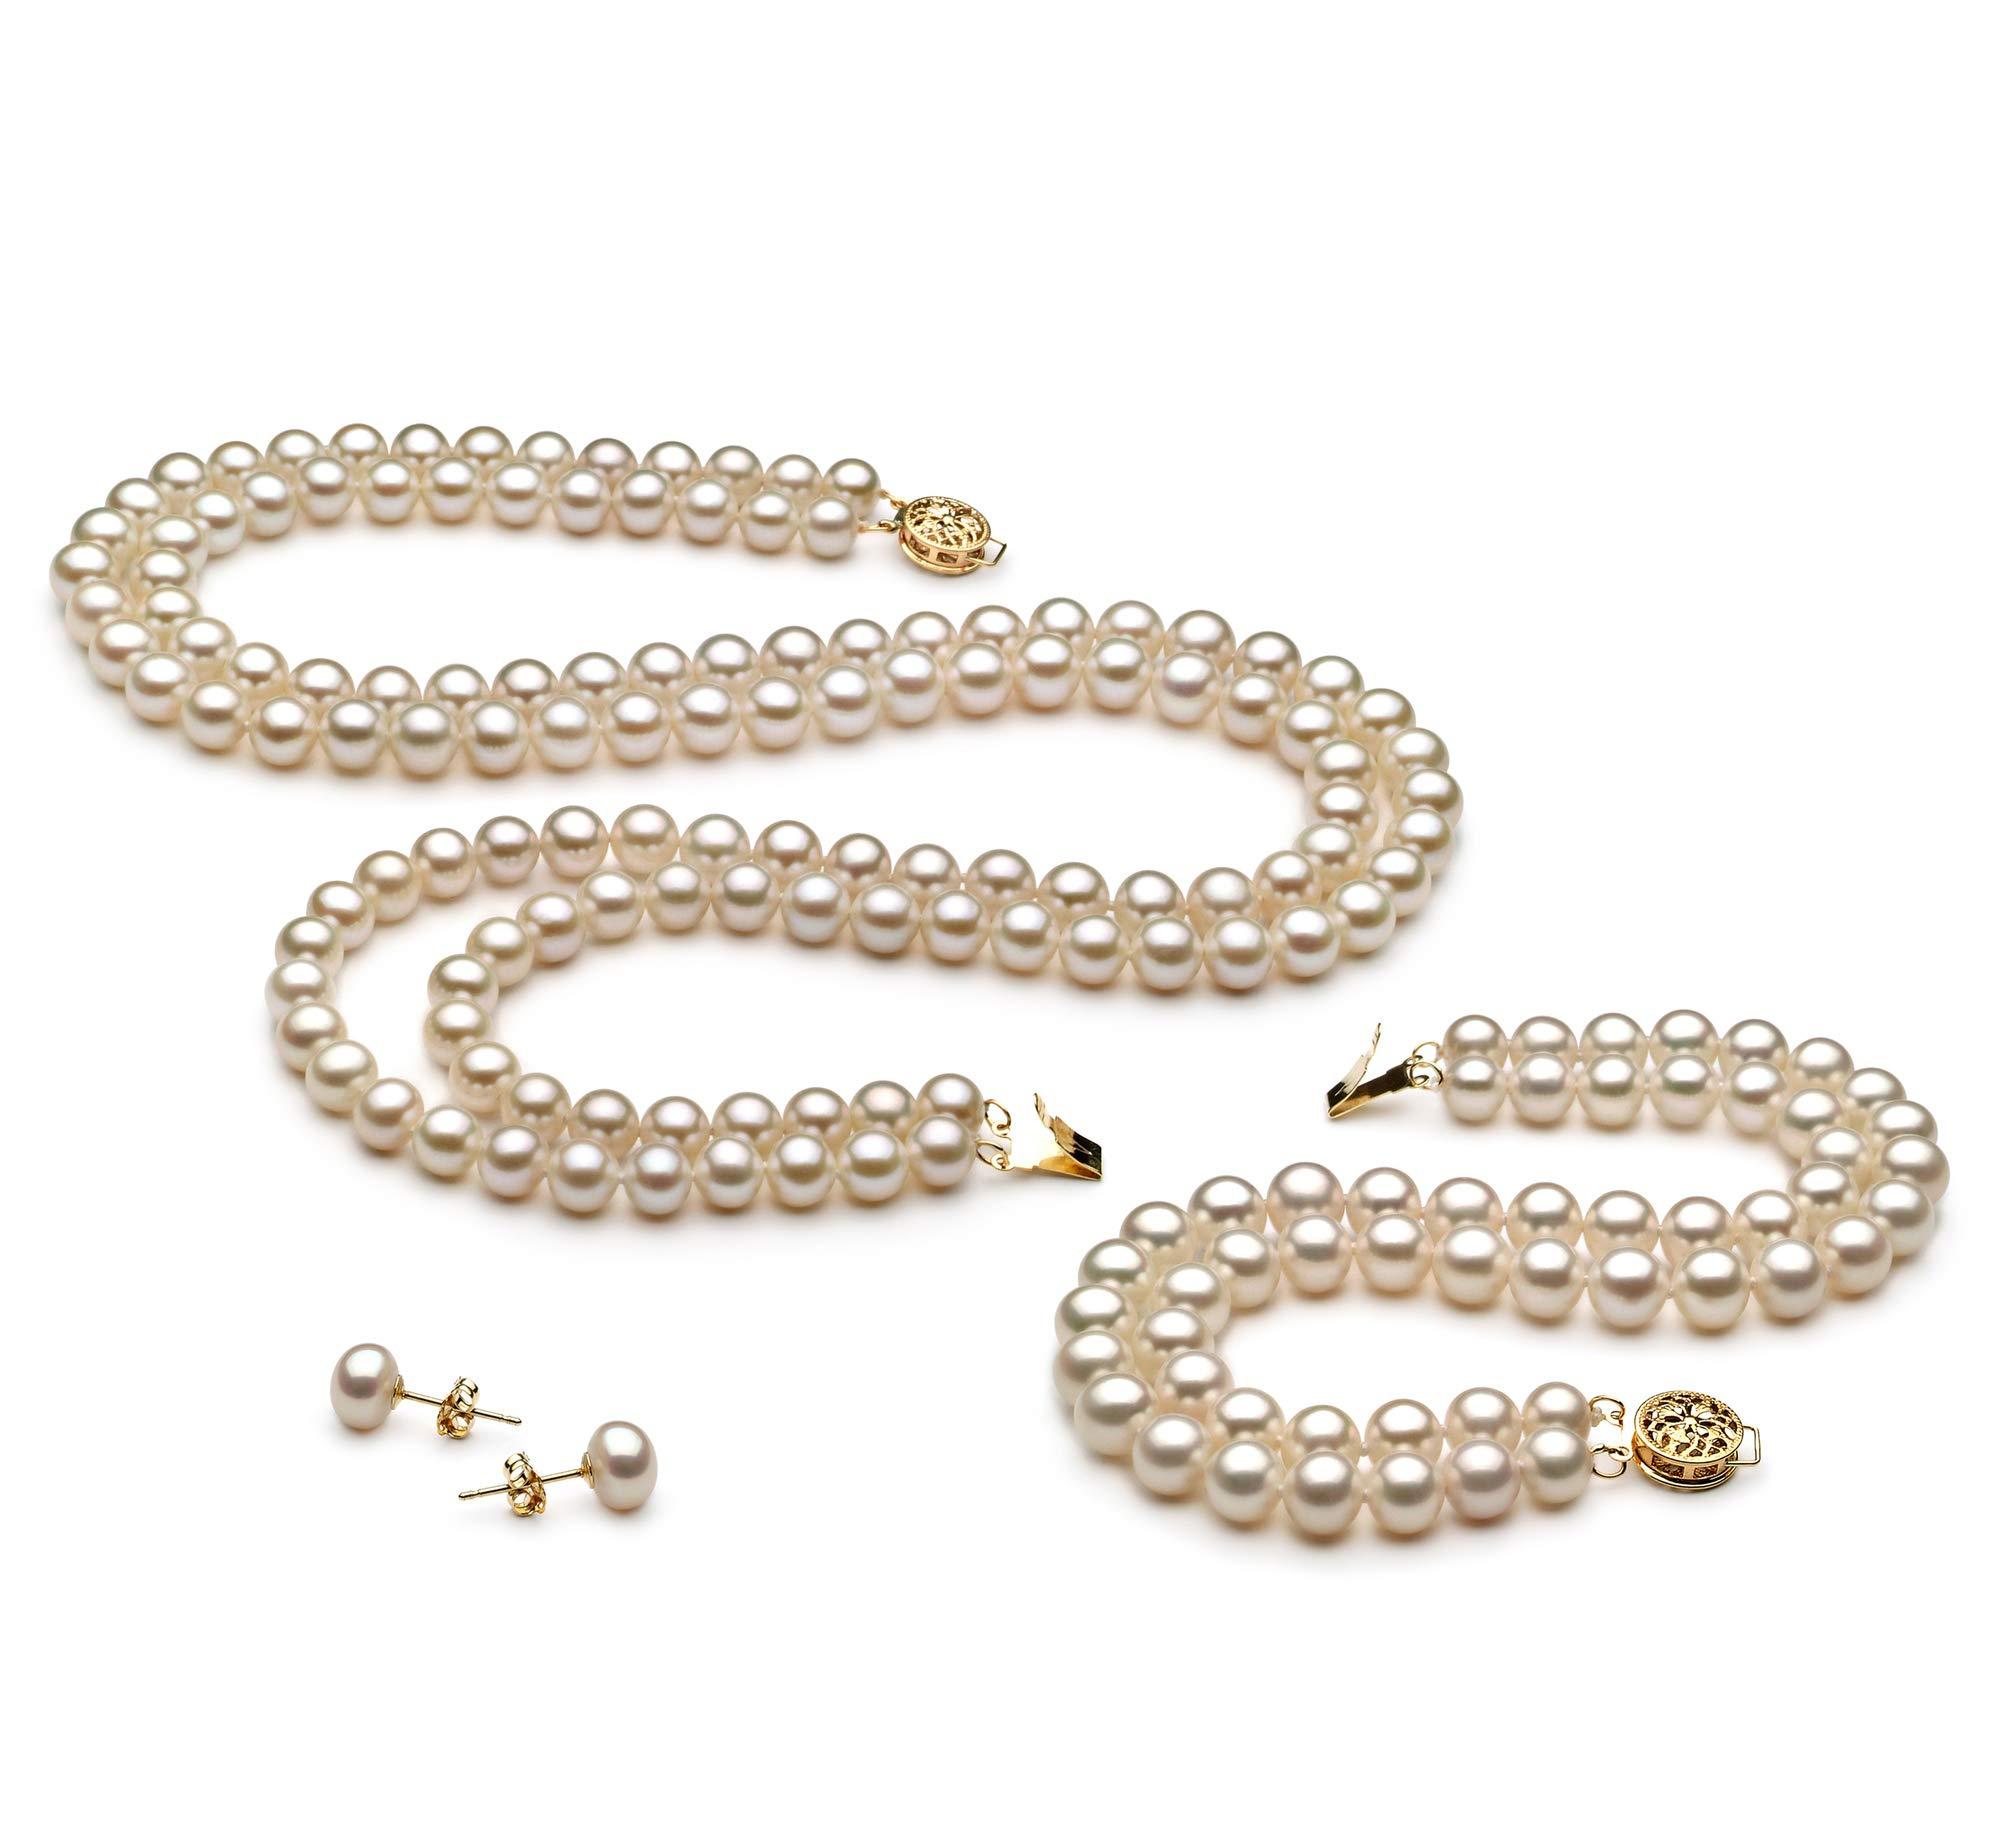 Liska White 6-7mm Double Strand AA Quality Freshwater Cultured Pearl Set for Women-16 in Chocker Length